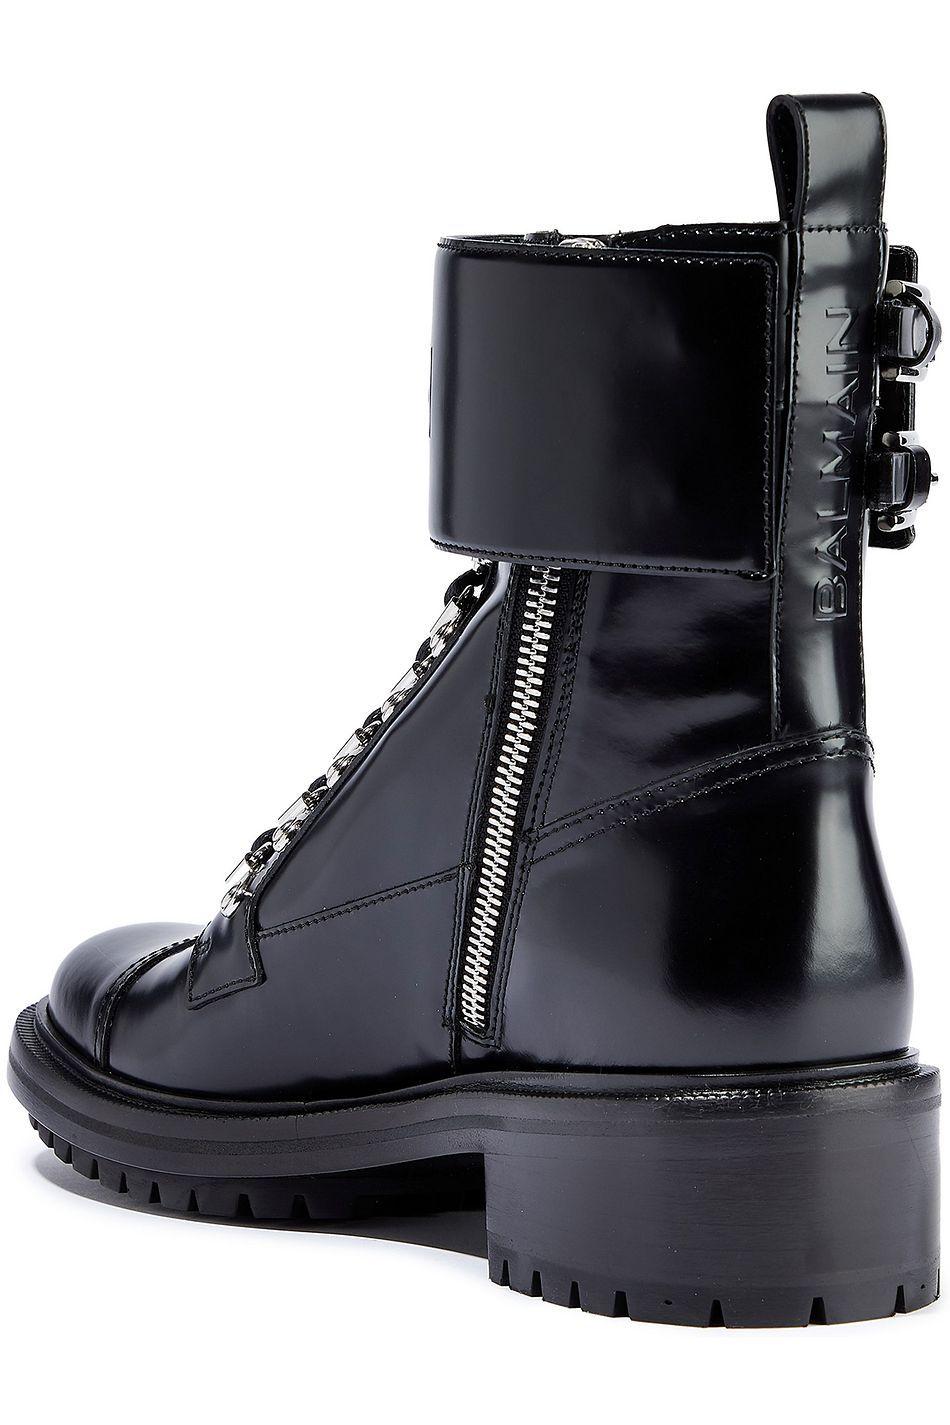 Black Embossed glossed-leather ankle